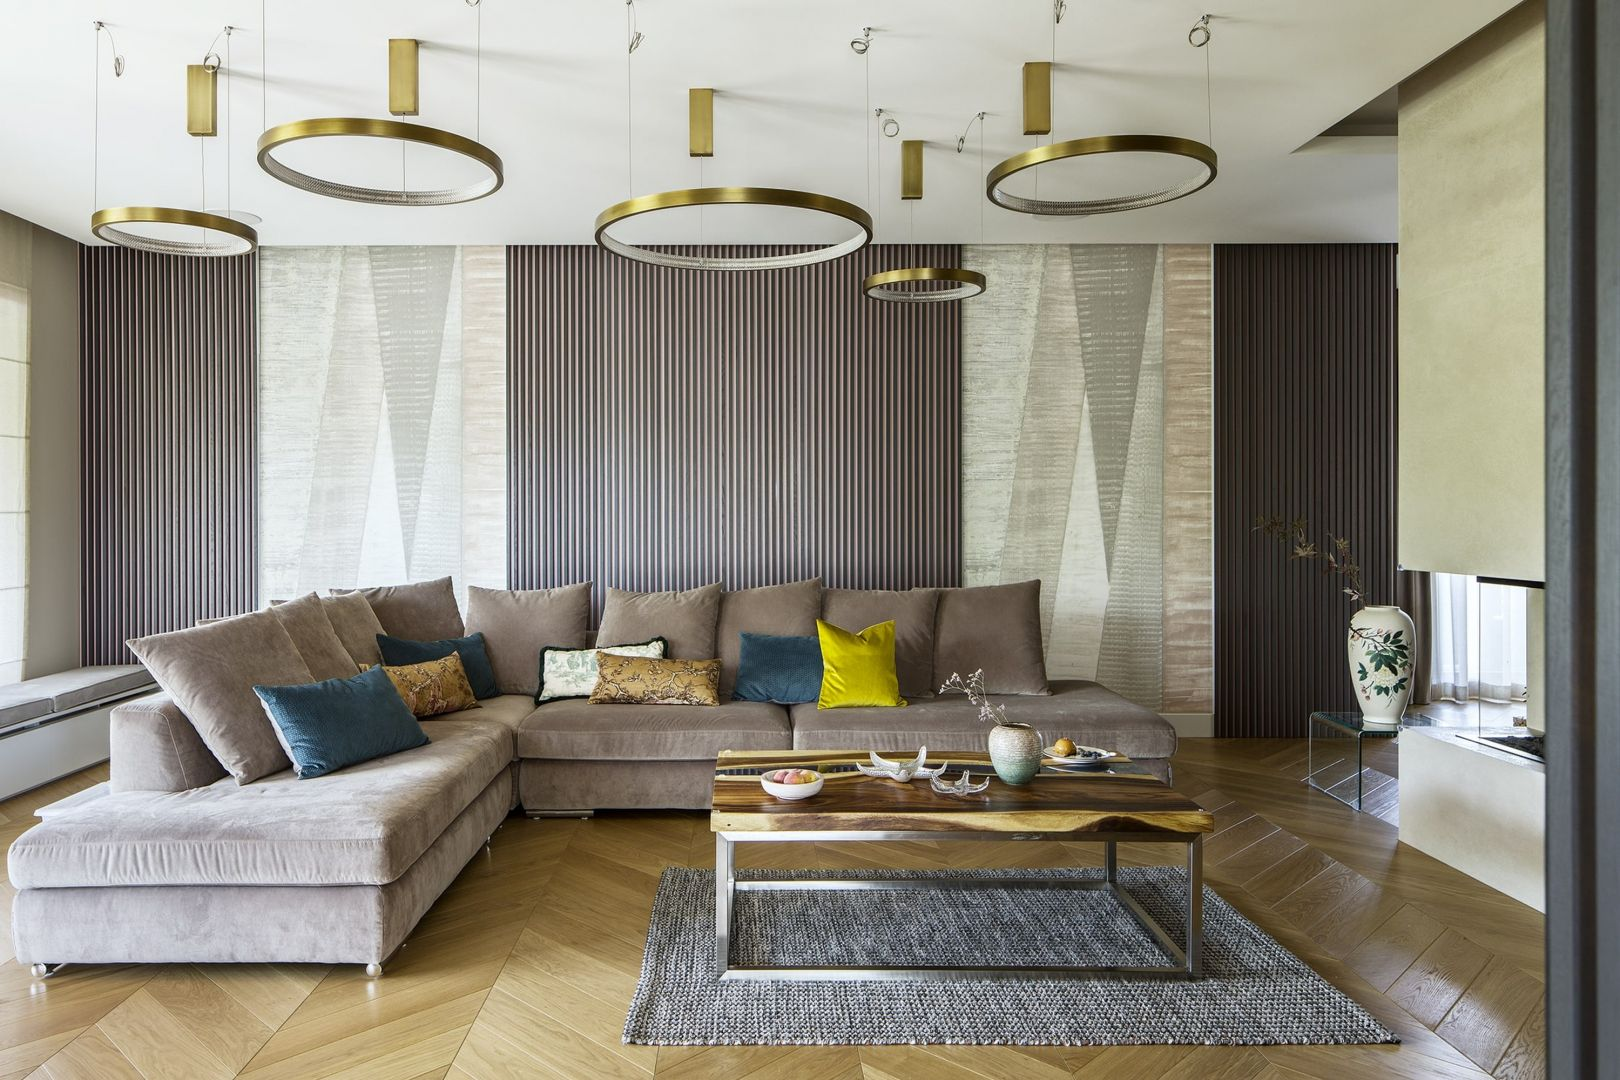 Złote lampy dodają salonowi blasku. Projekt Tissu Architecture. fot. Yassen Hristov